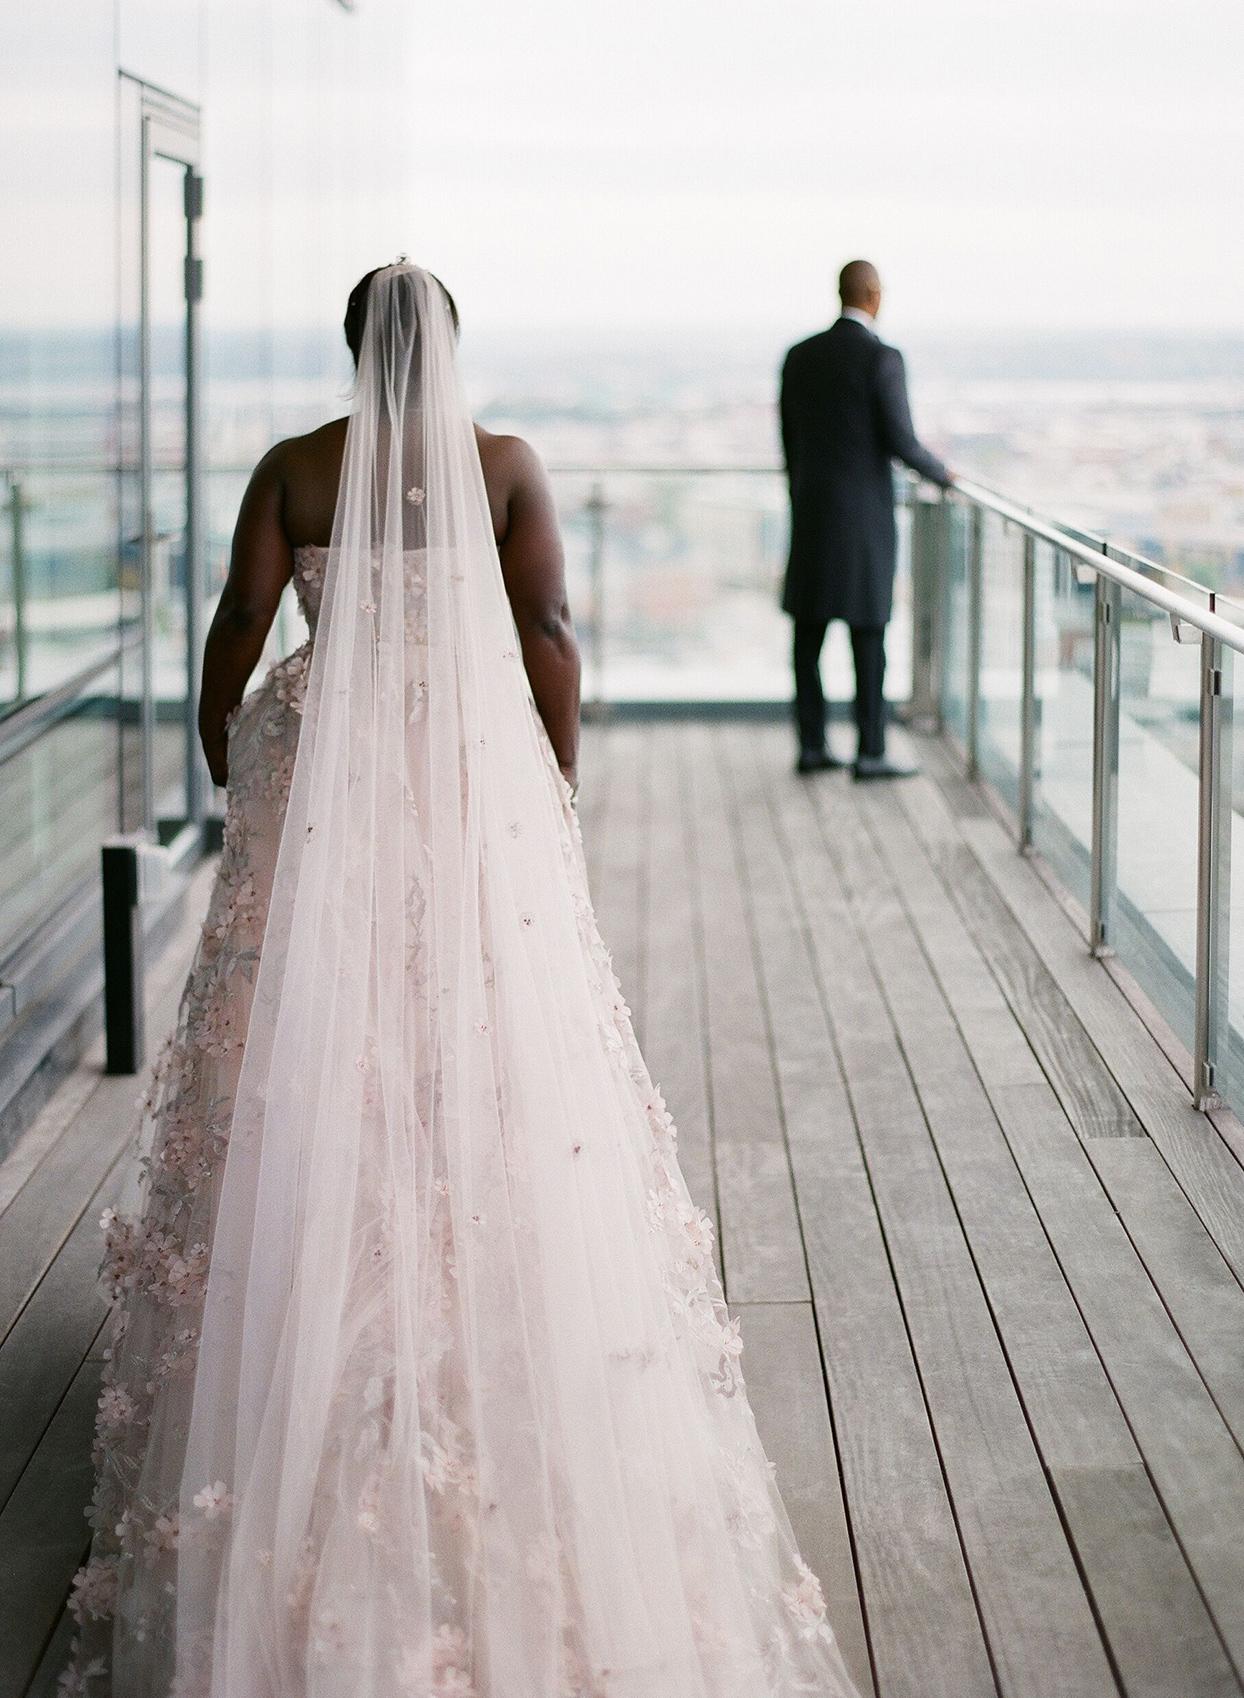 bride walking toward groom on balcony for first look